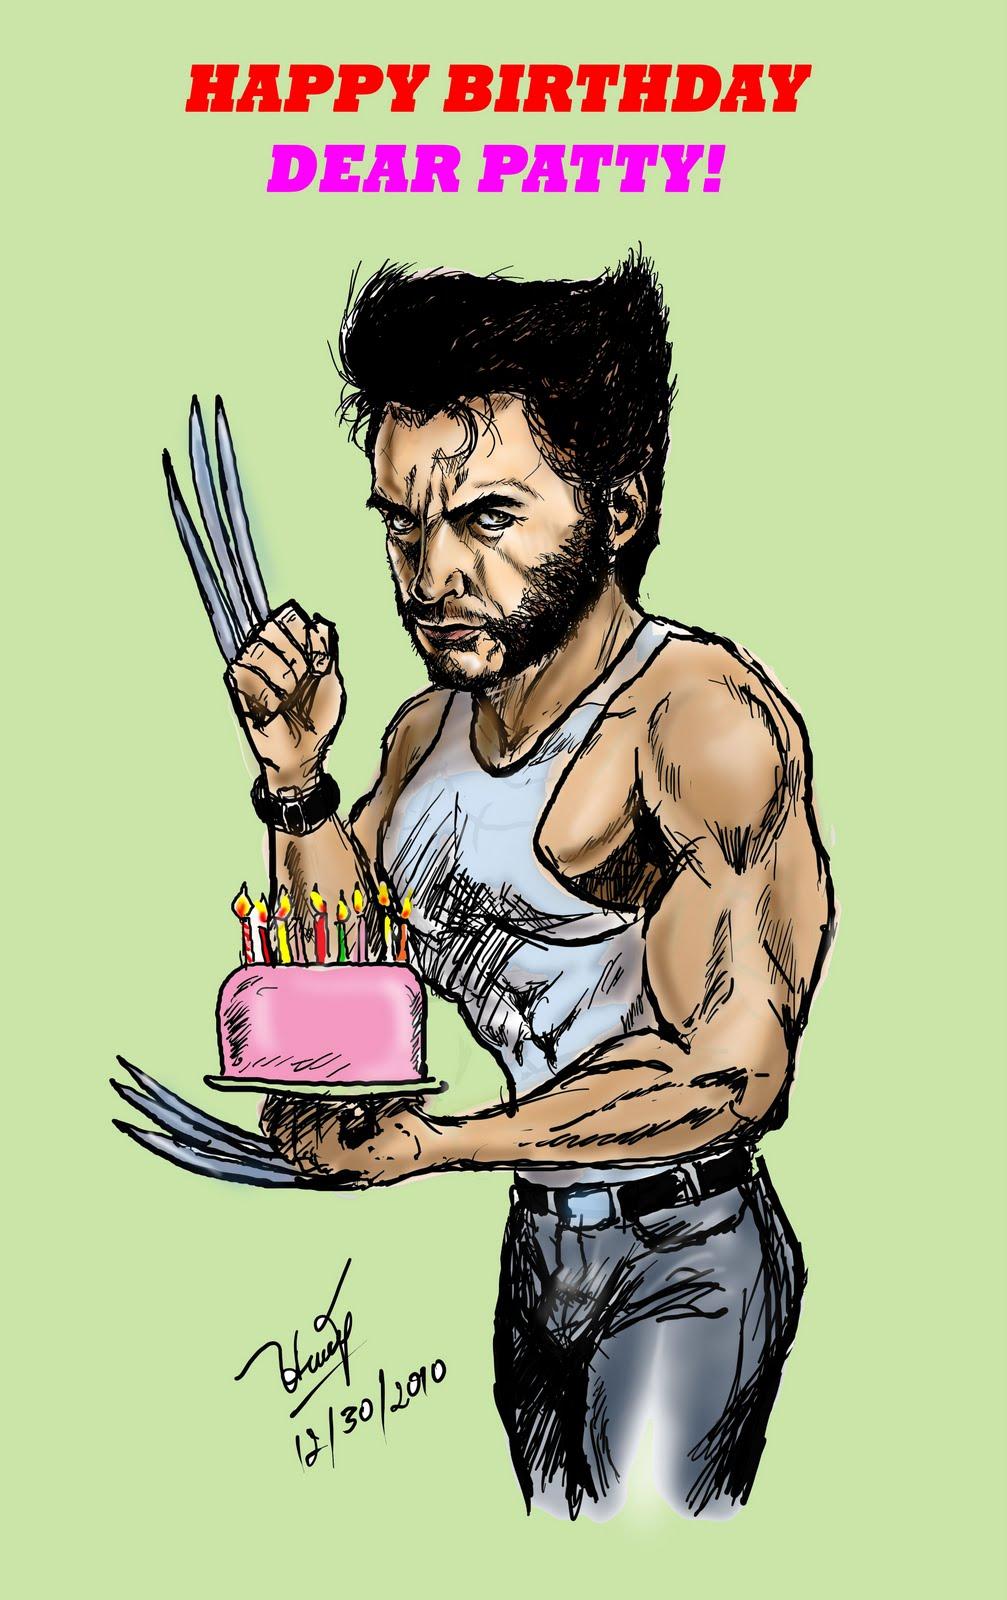 wolverine birthday Stories and Art: Happy Birthday, Patty! (from The Wolverine) wolverine birthday